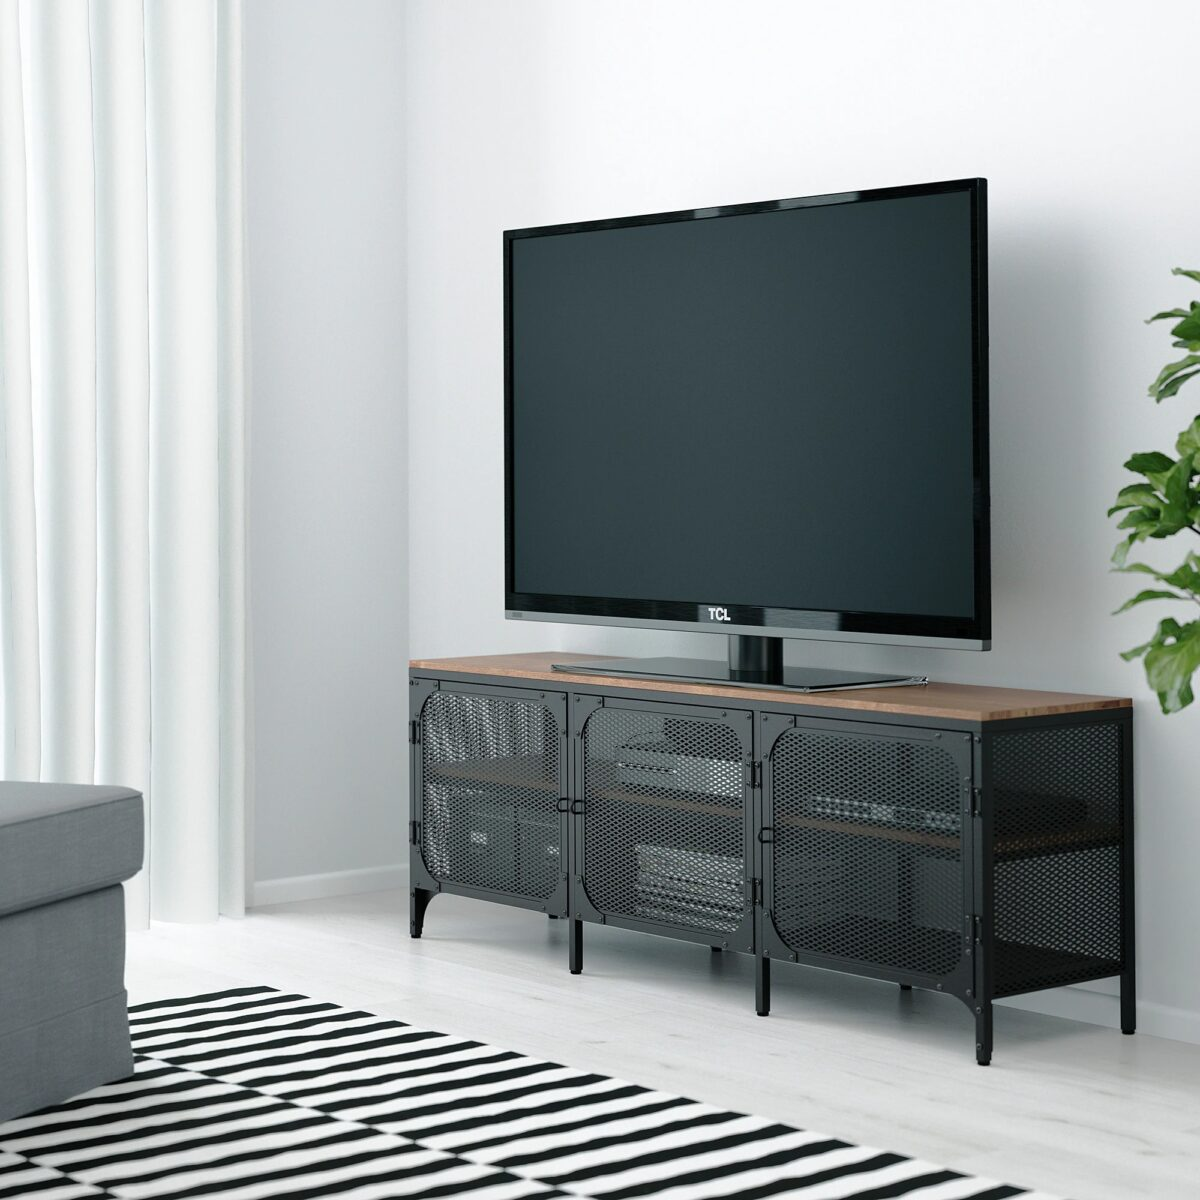 fjaellbo-mobile-tv-